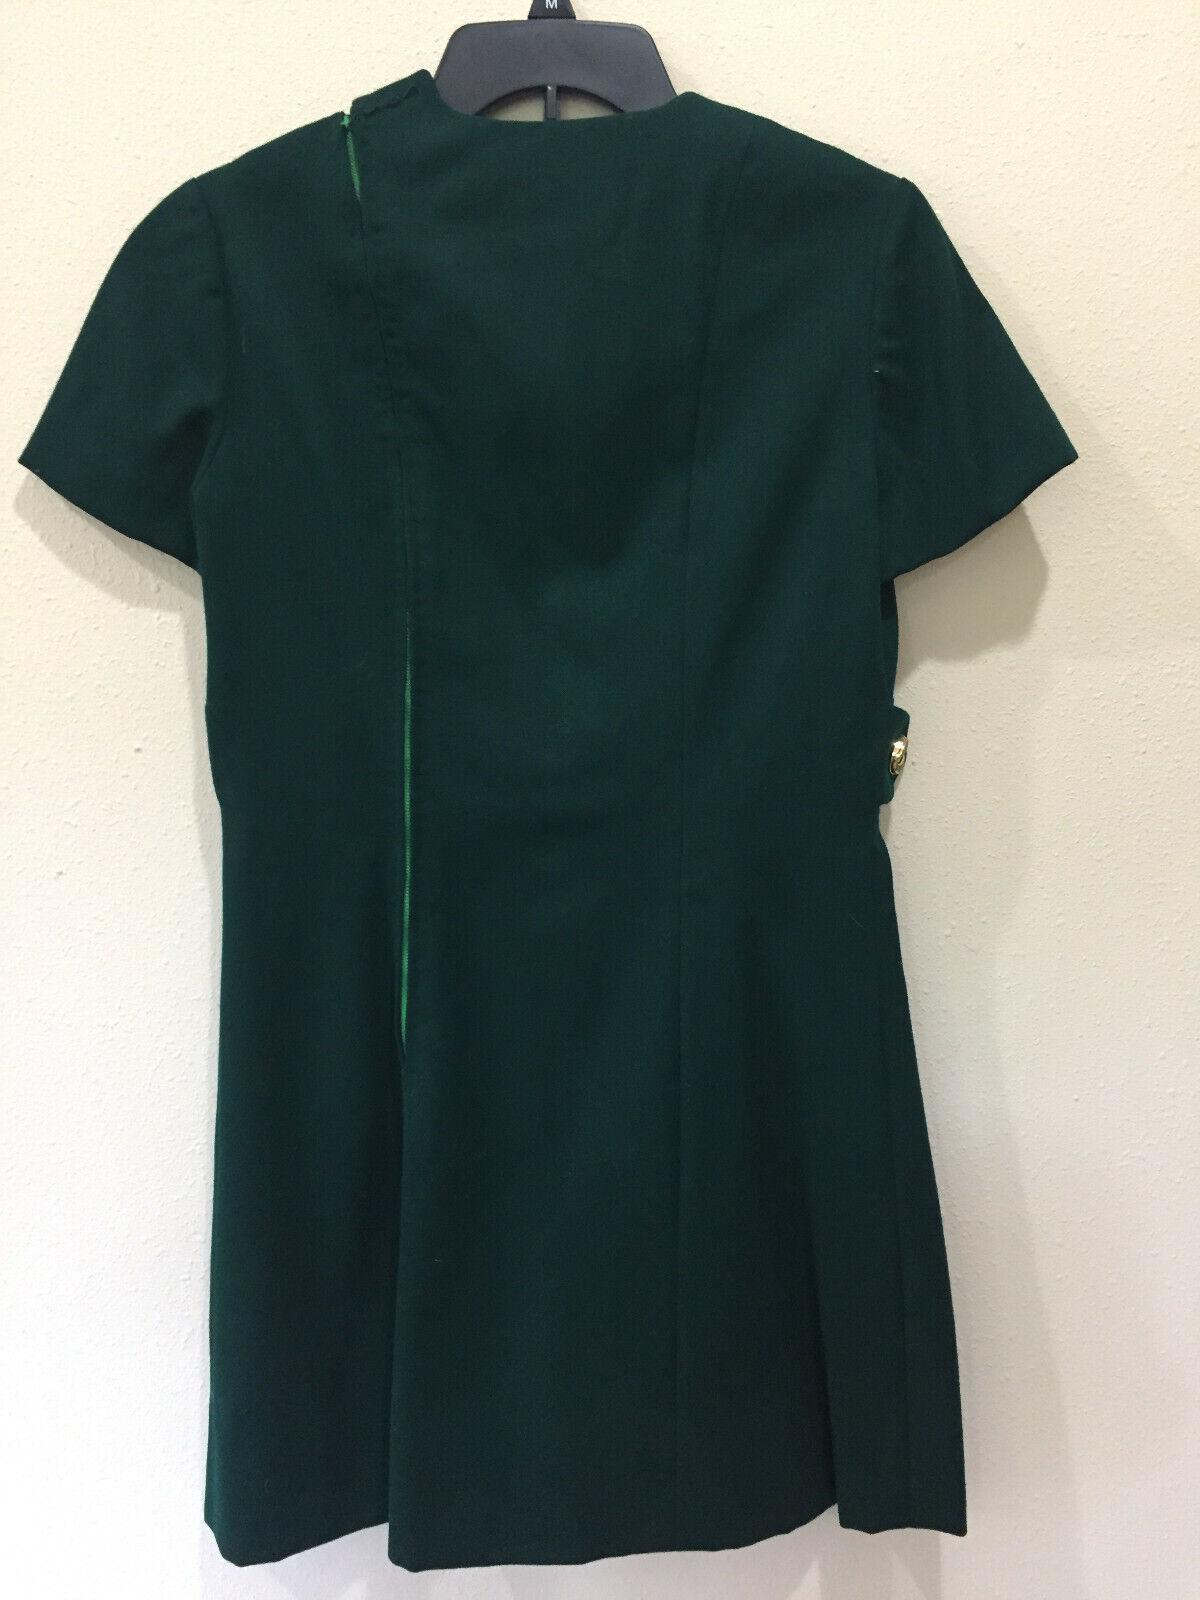 Vintage Vogue Couturier Design Wool Dress Small D… - image 2